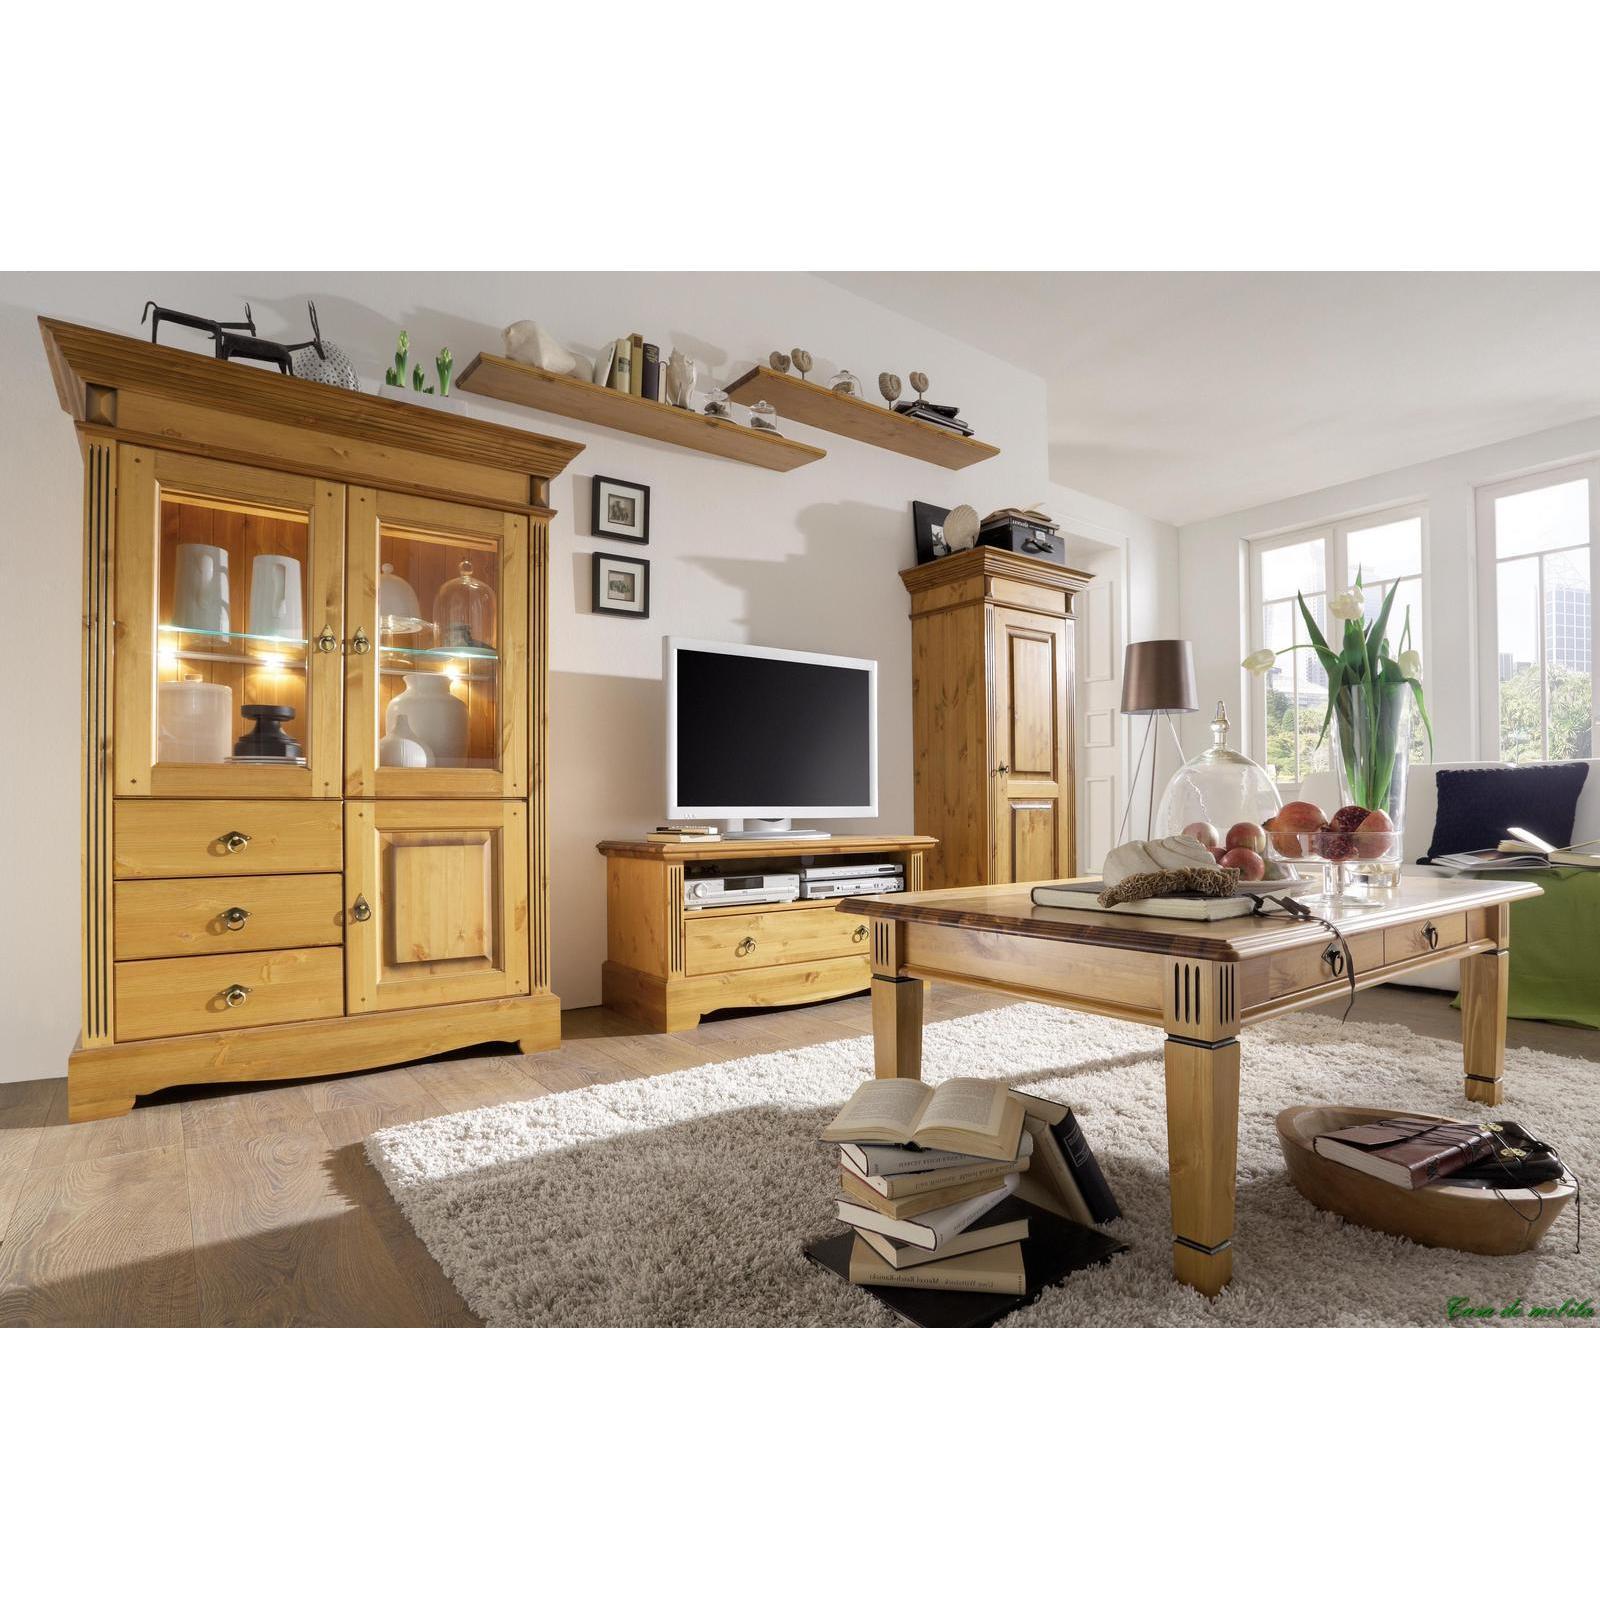 landhaus highboard goldbraun patiniert g teborg kiefer massiv. Black Bedroom Furniture Sets. Home Design Ideas